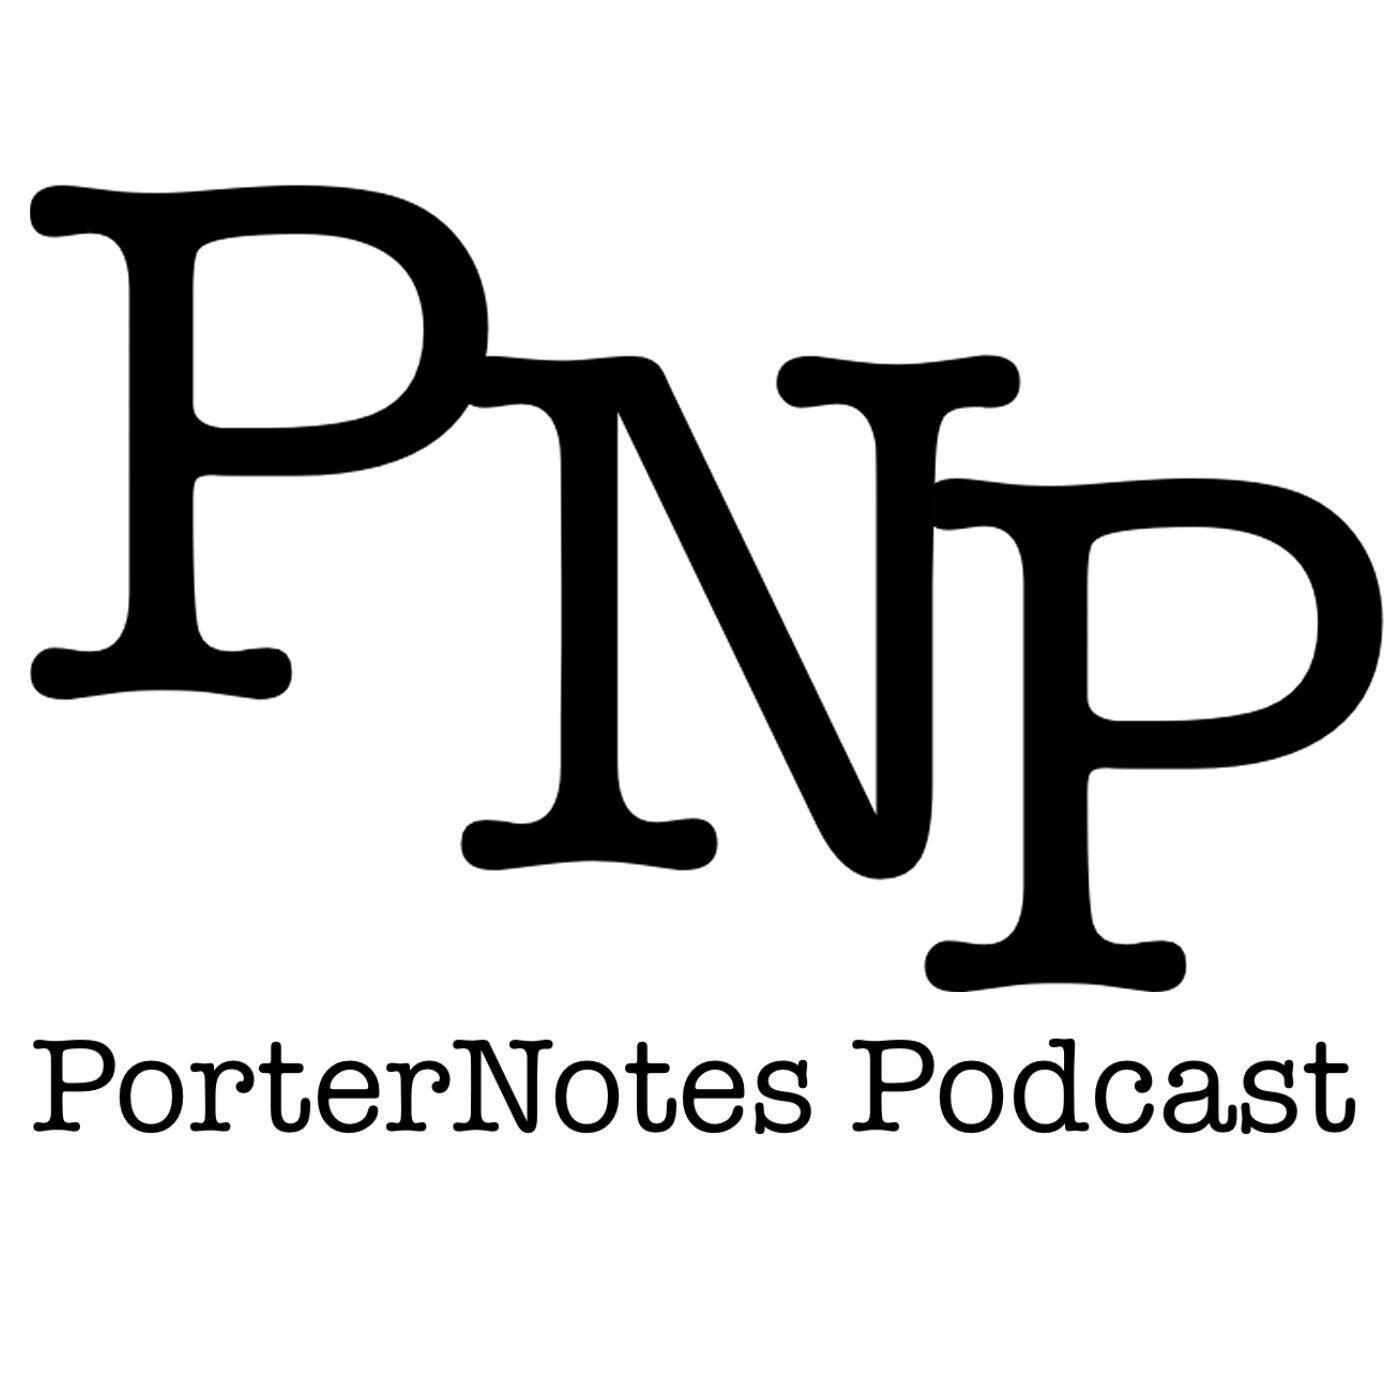 The PorterNotes Podcast